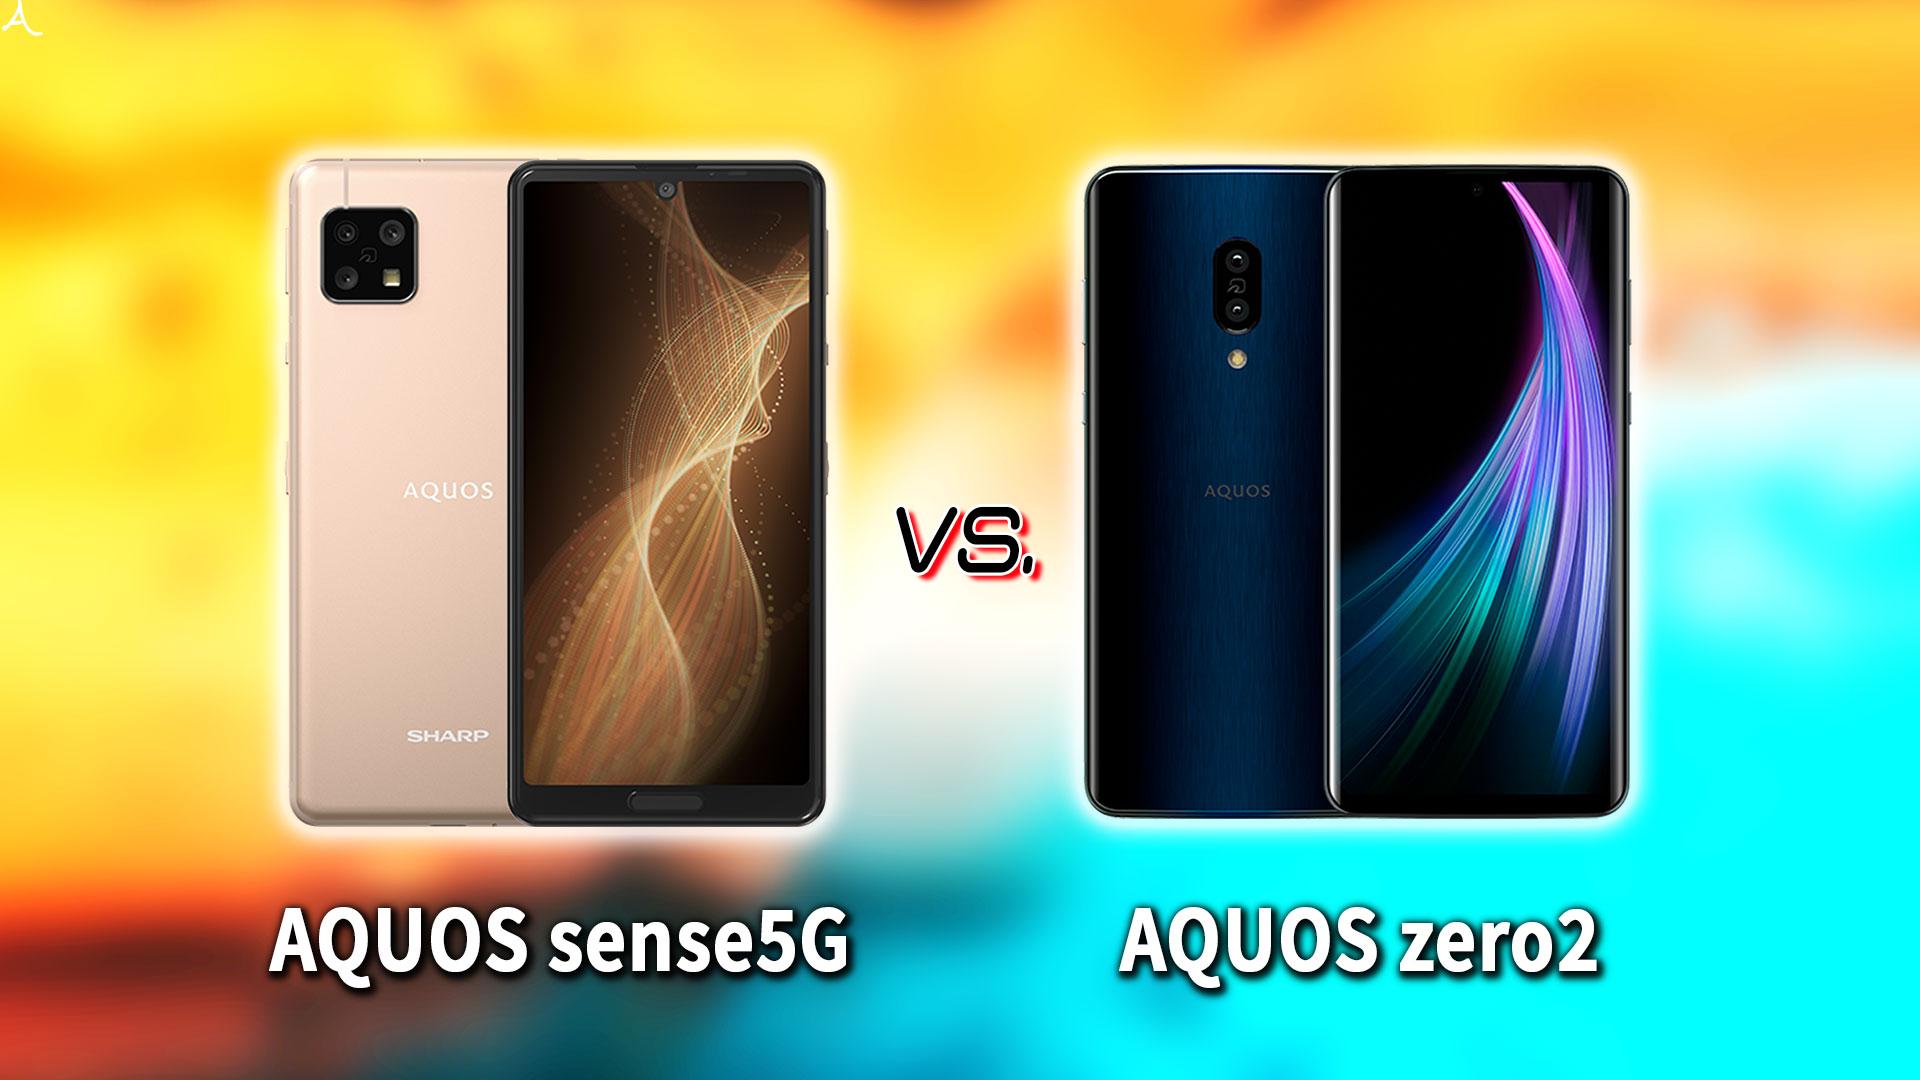 「AQUOS sense5G」と「AQUOS zero2」の違いを比較:どっちを買う?